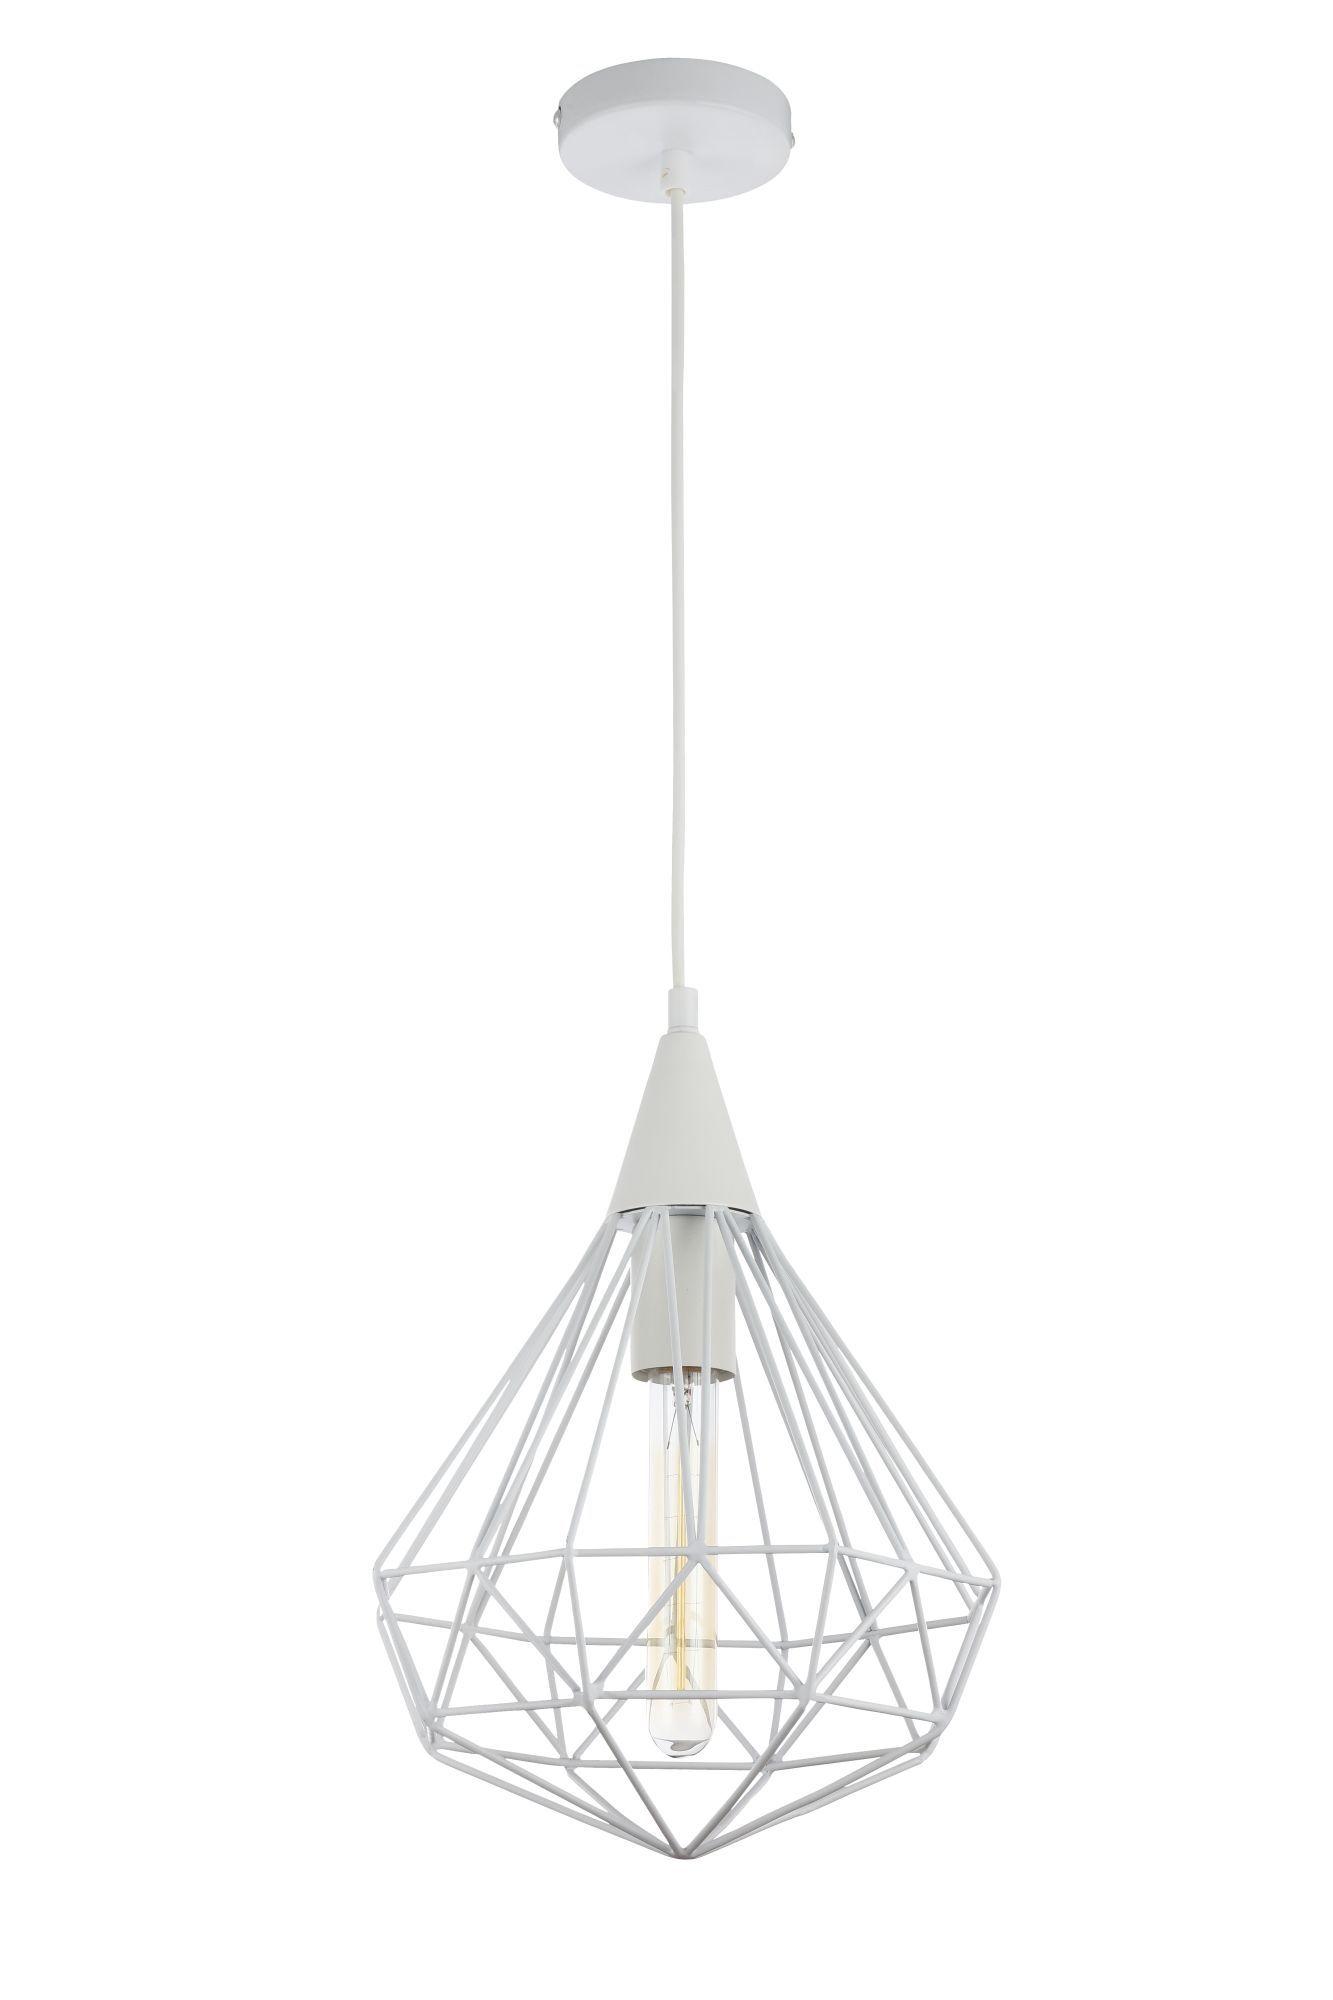 Подвесной светильник Maytoni Loft Calaf P360-PL-250-W (MOD360-01-W), 1xE27x60W, белый, металл - фото 1